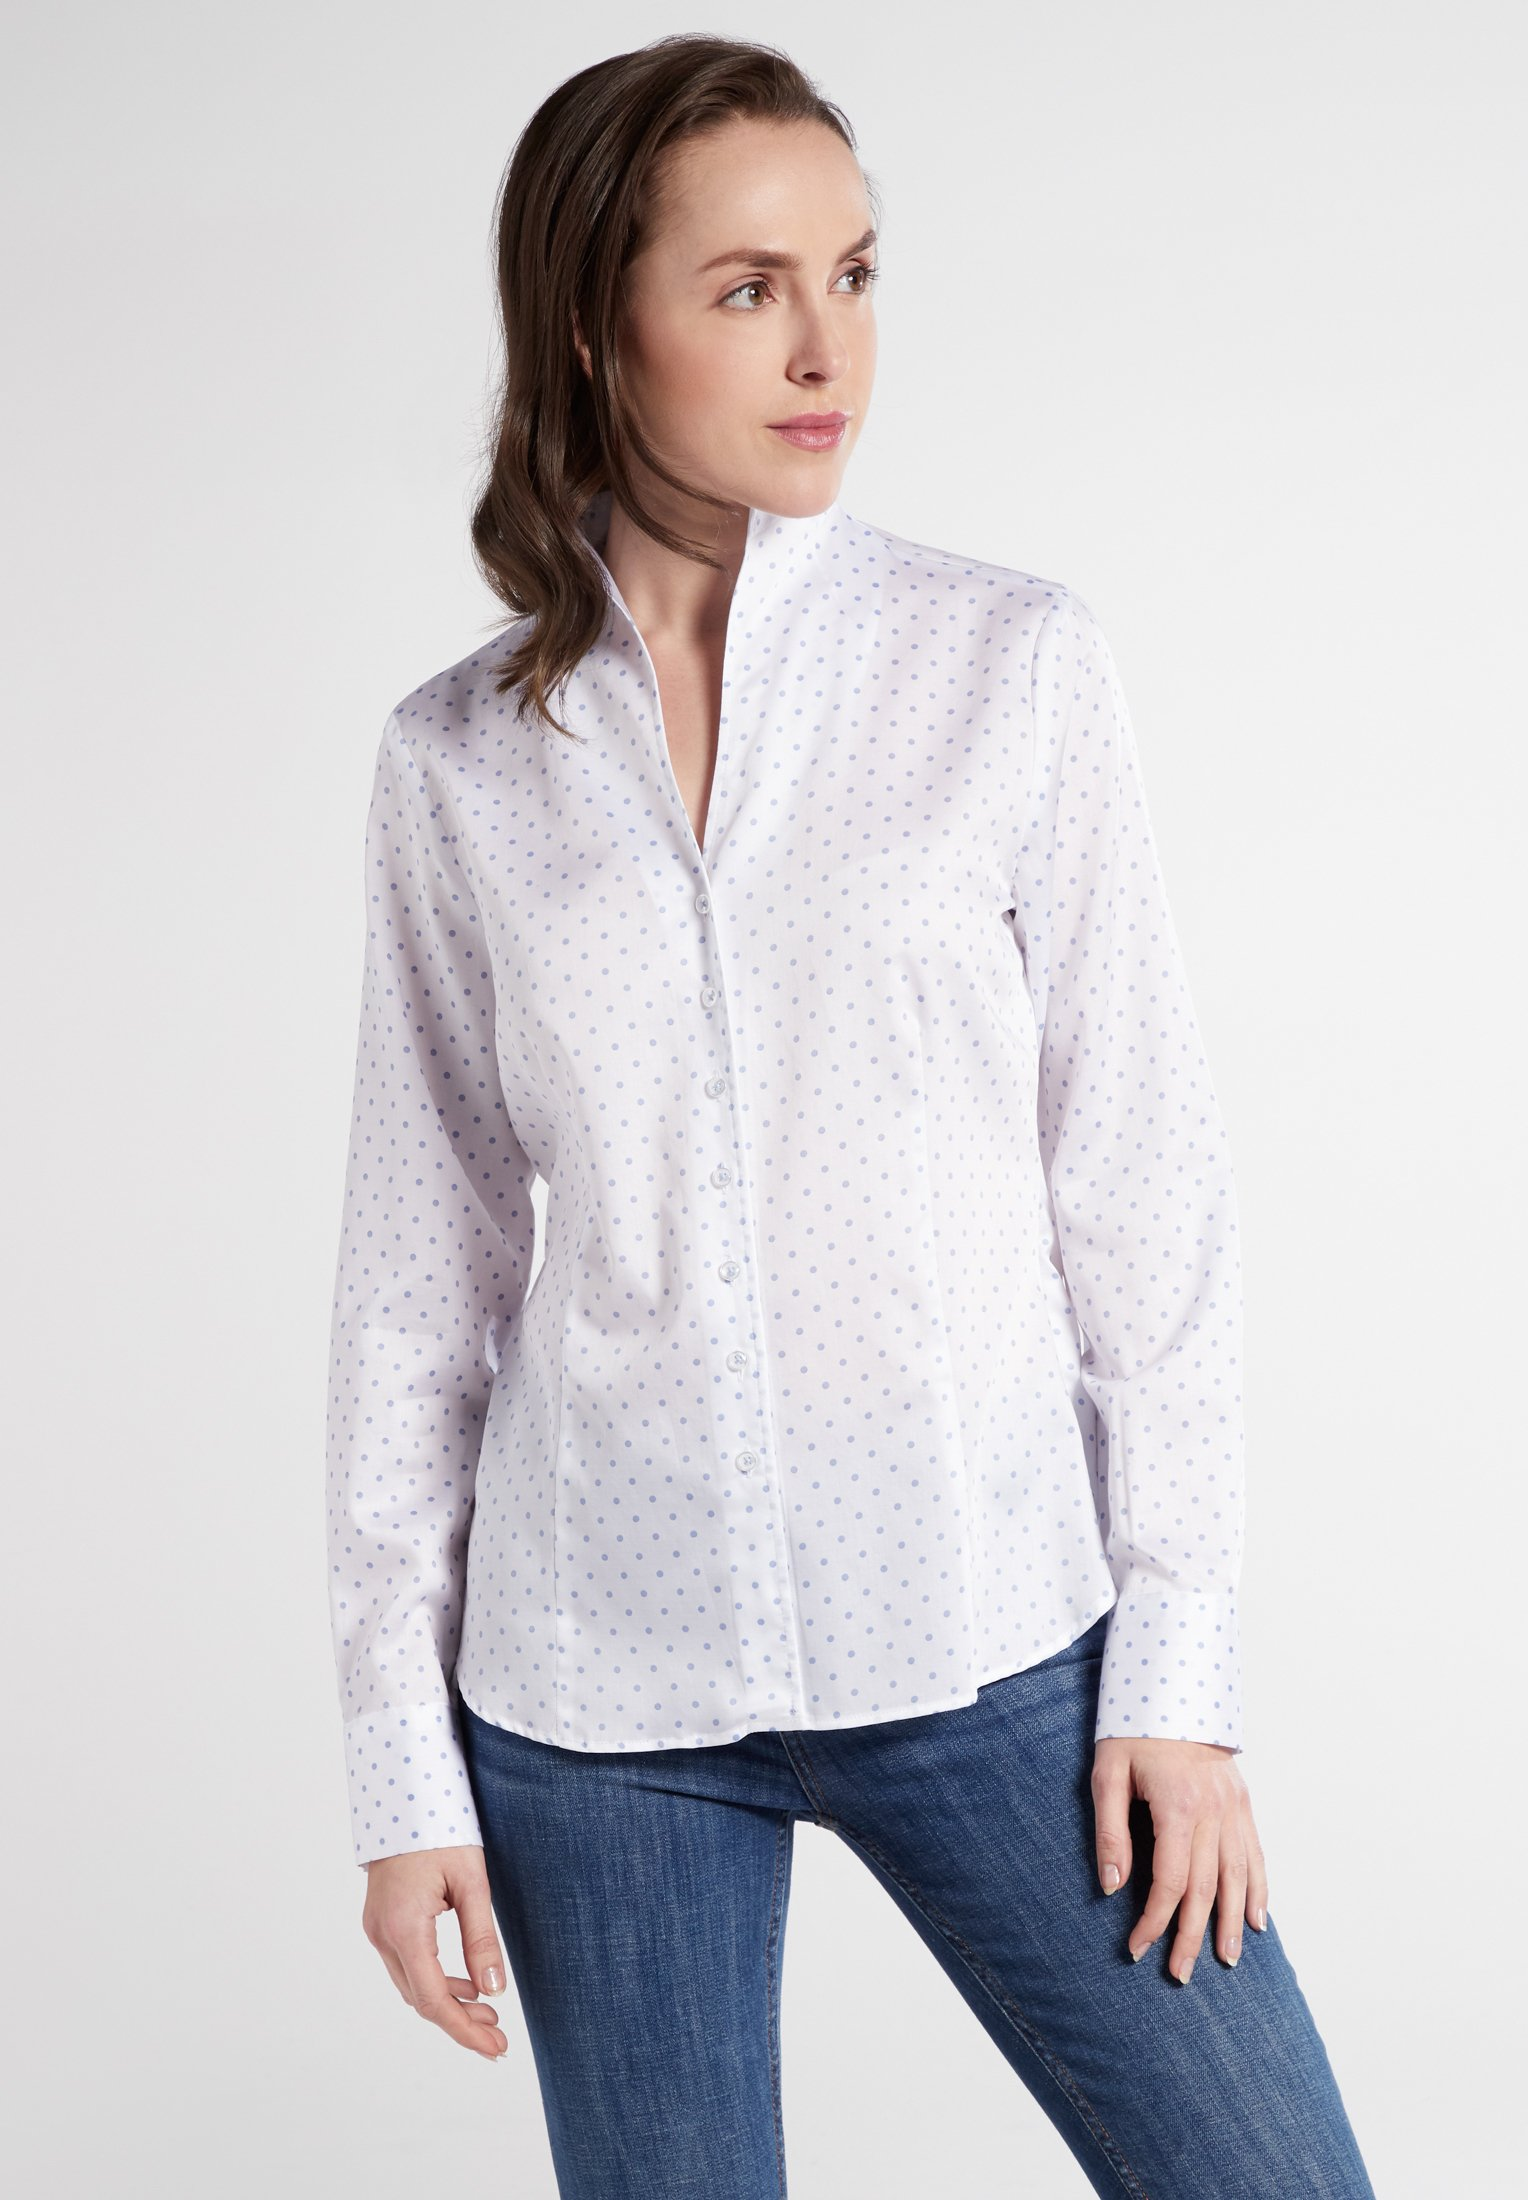 Eterna LONG SLEEVE - Overhemdblouse - white/light blue - Dameskleding AAA-kwaliteit